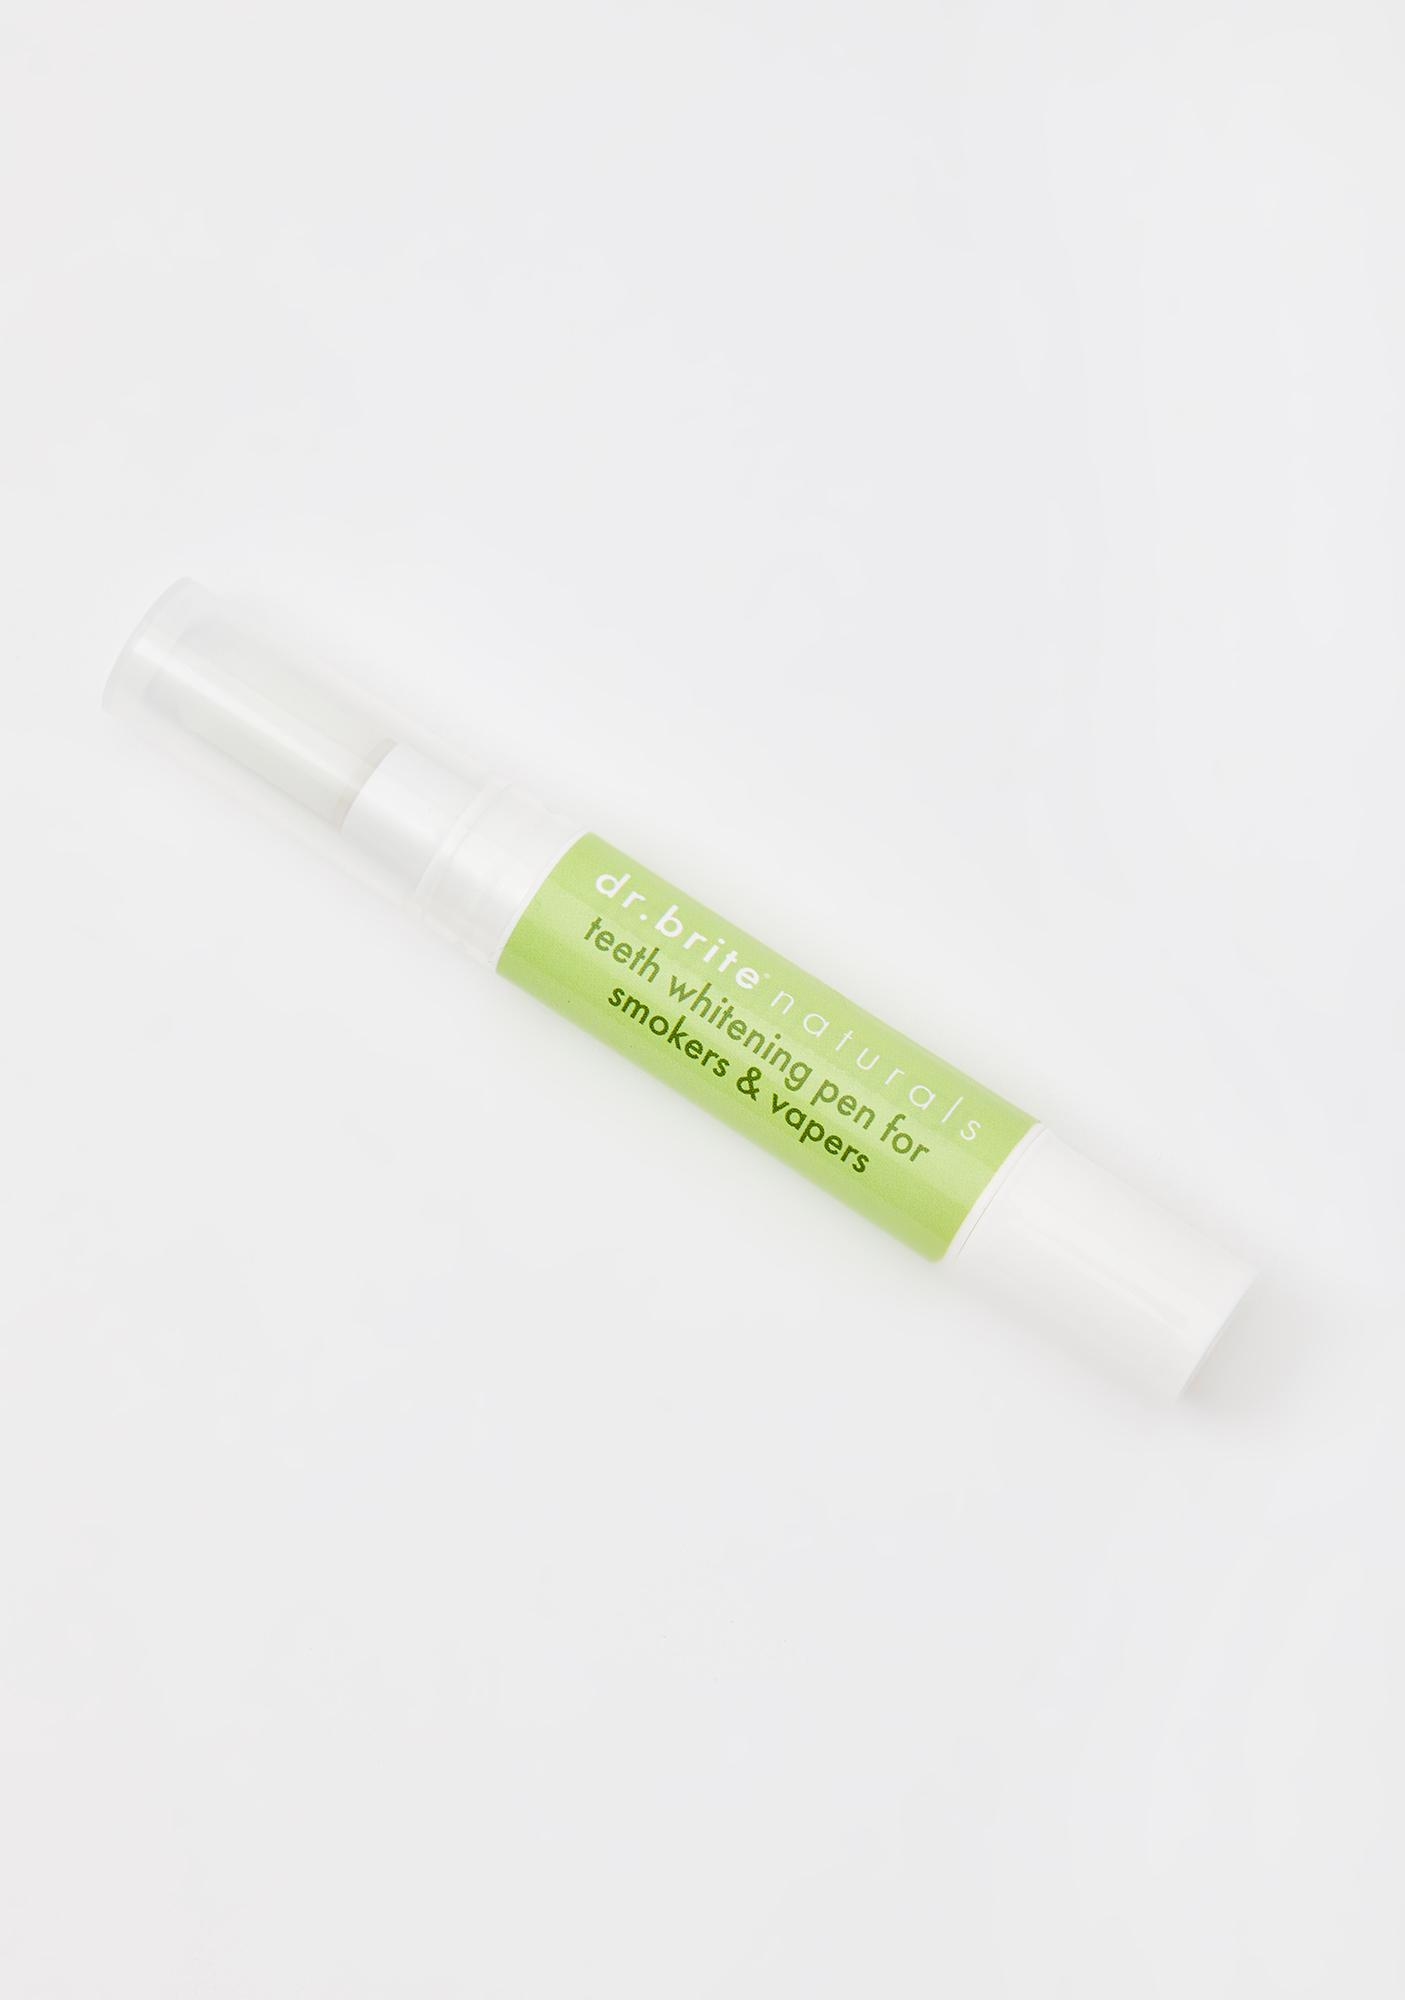 Dr. Brite Smokers N' Vapers Natural Teeth Whitening Pen